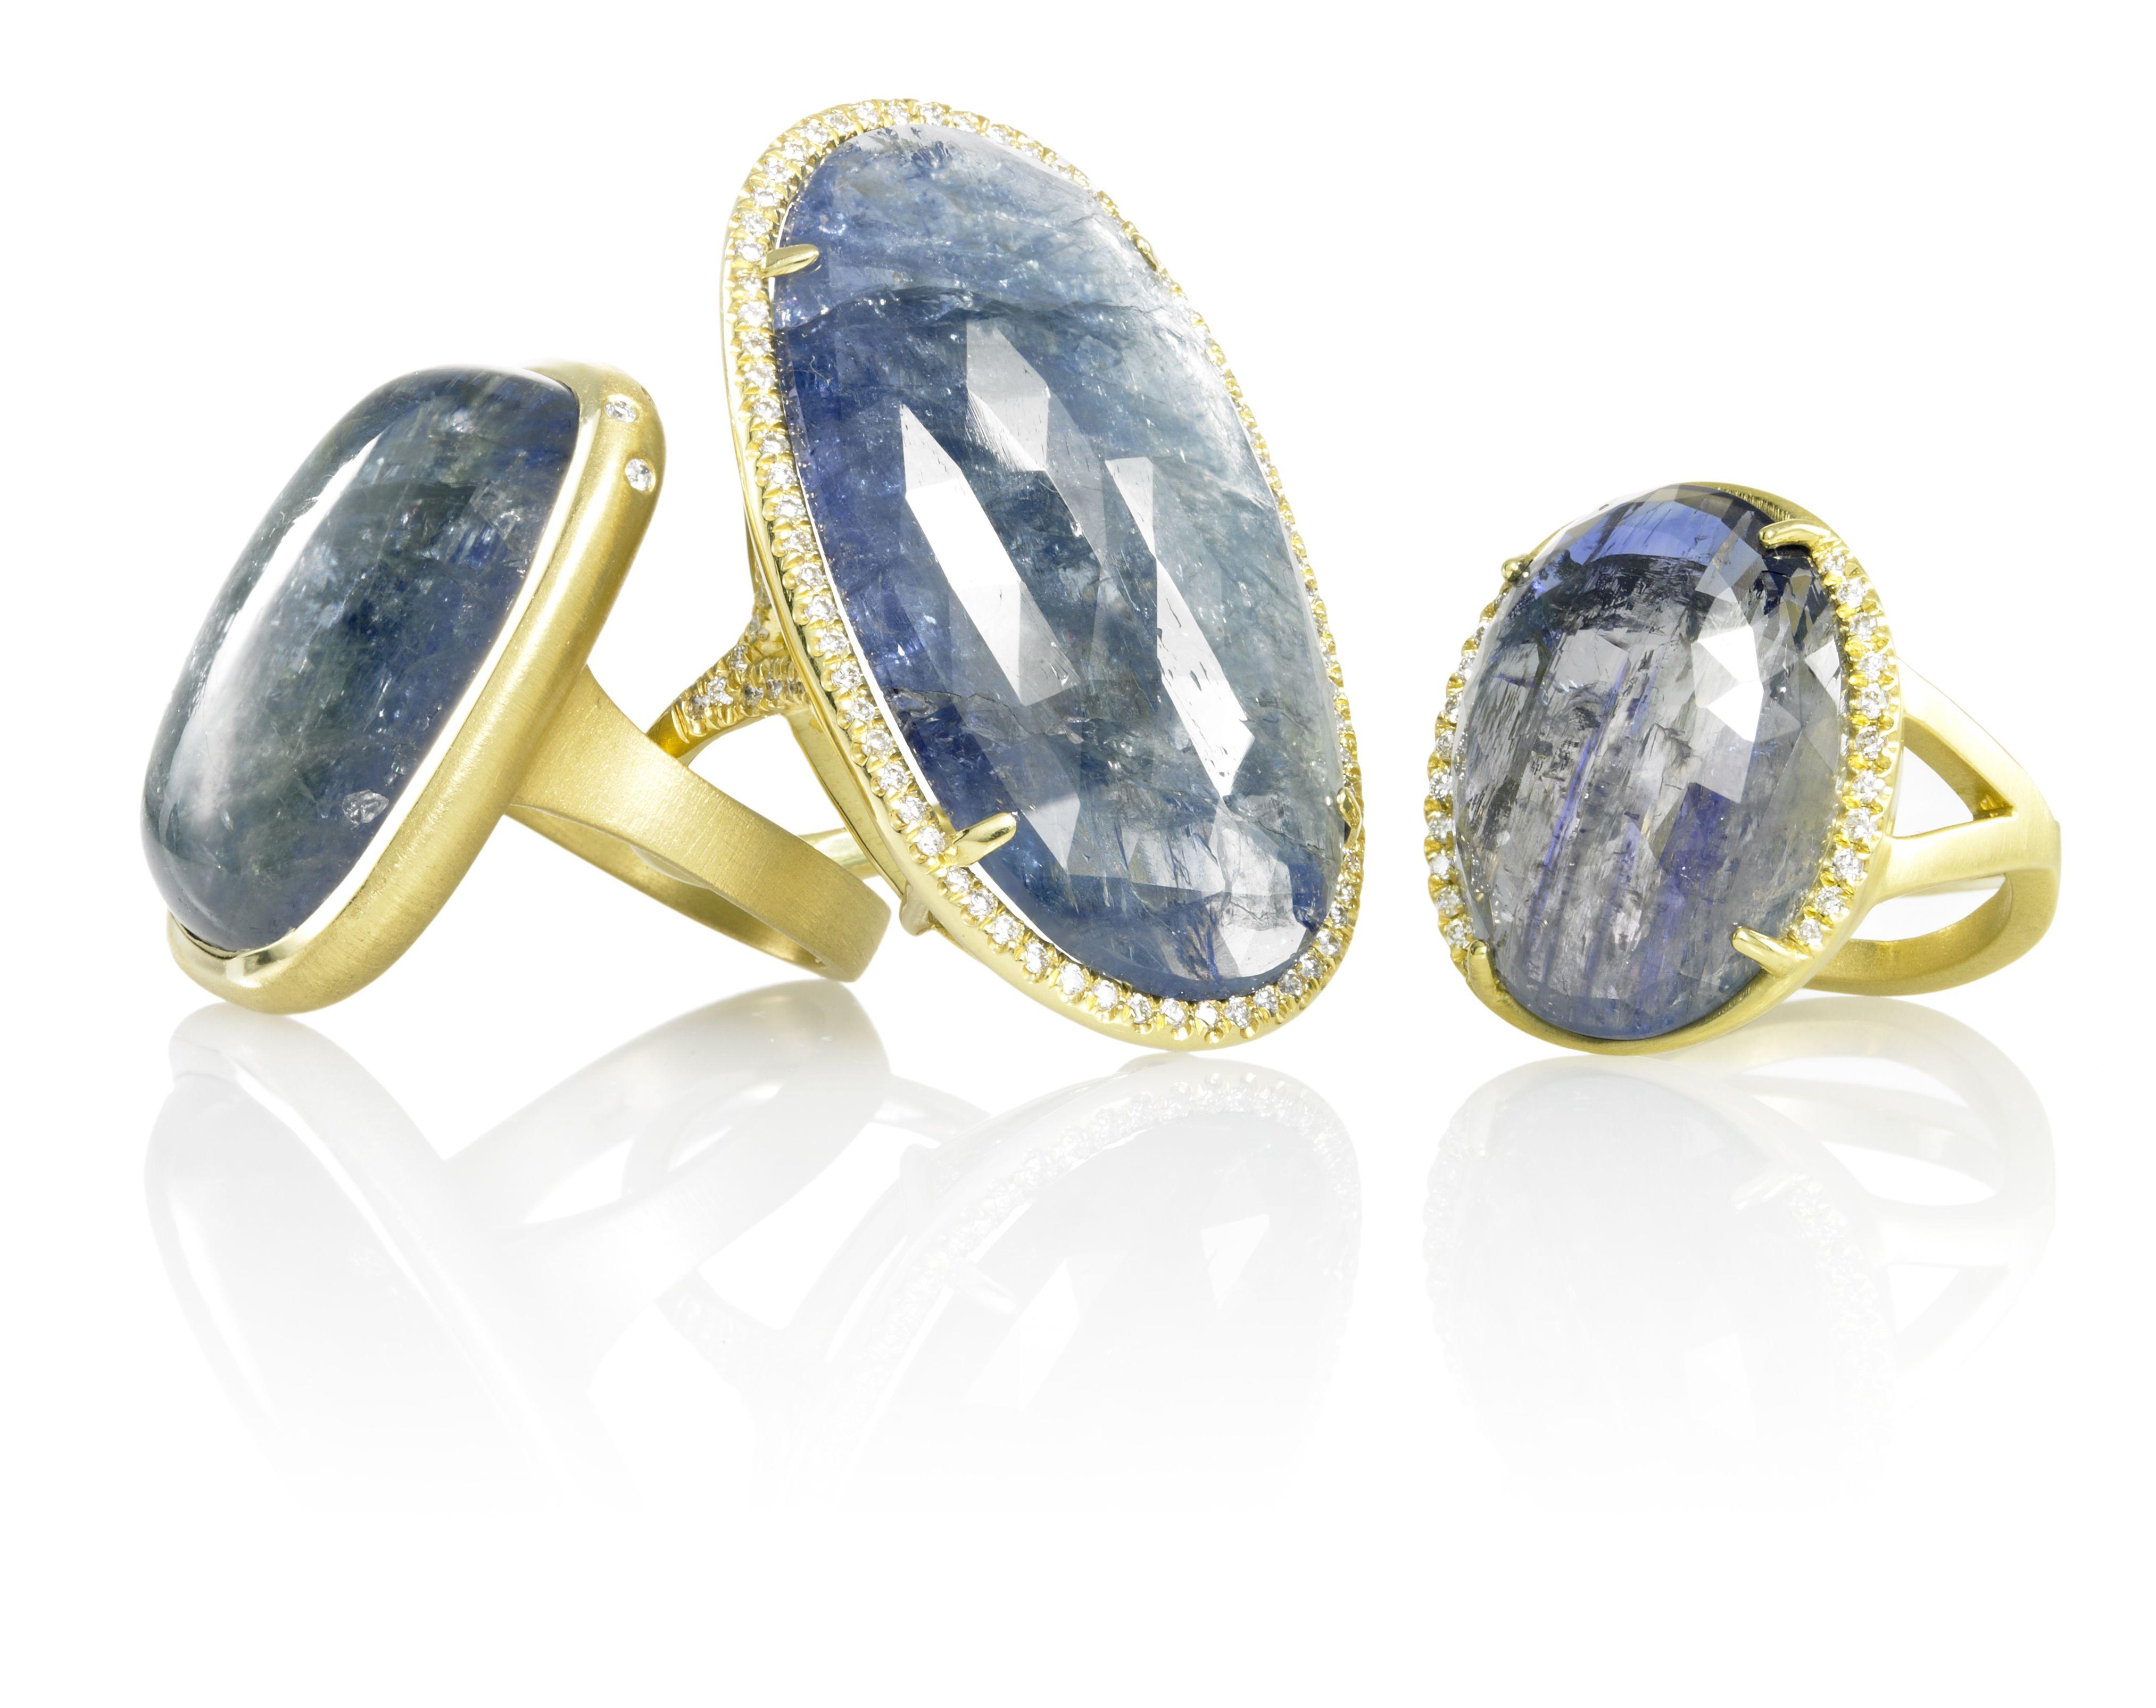 Anillo de compromiso Roberto Coin en oro blanco de 18 quilates con topacio azul y diamantes blancos .